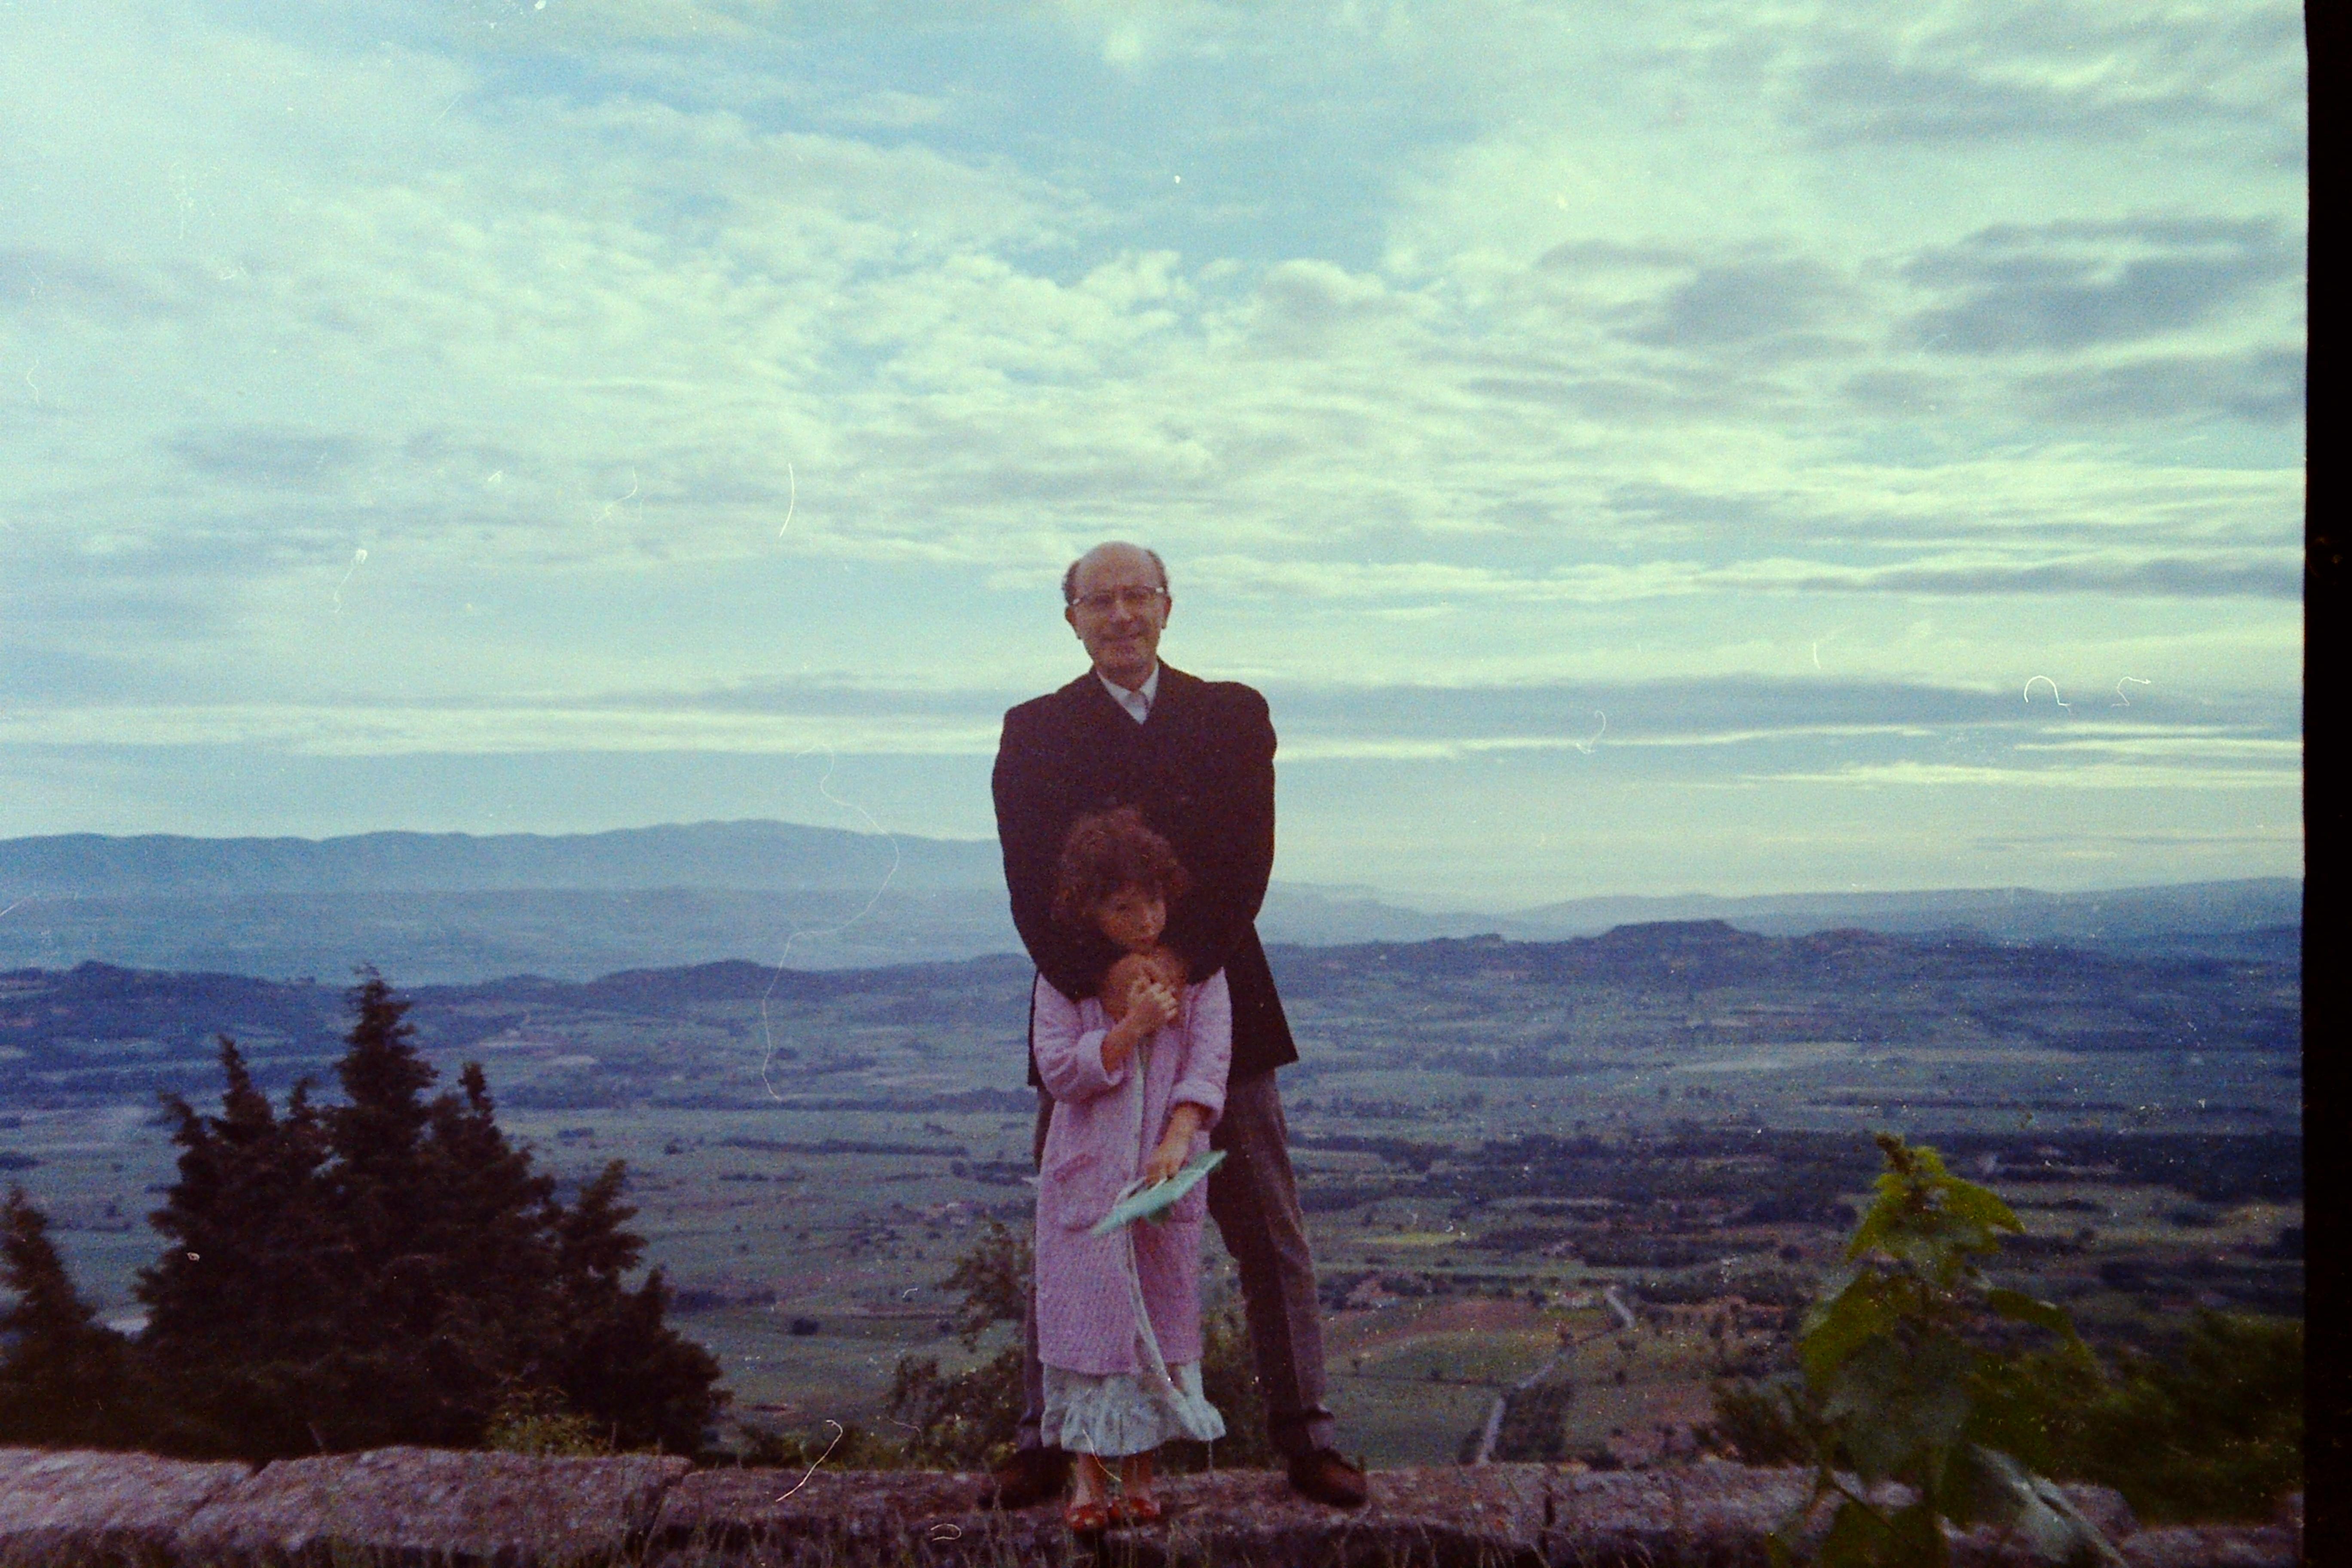 Nicole pink robe & Papa Gordes